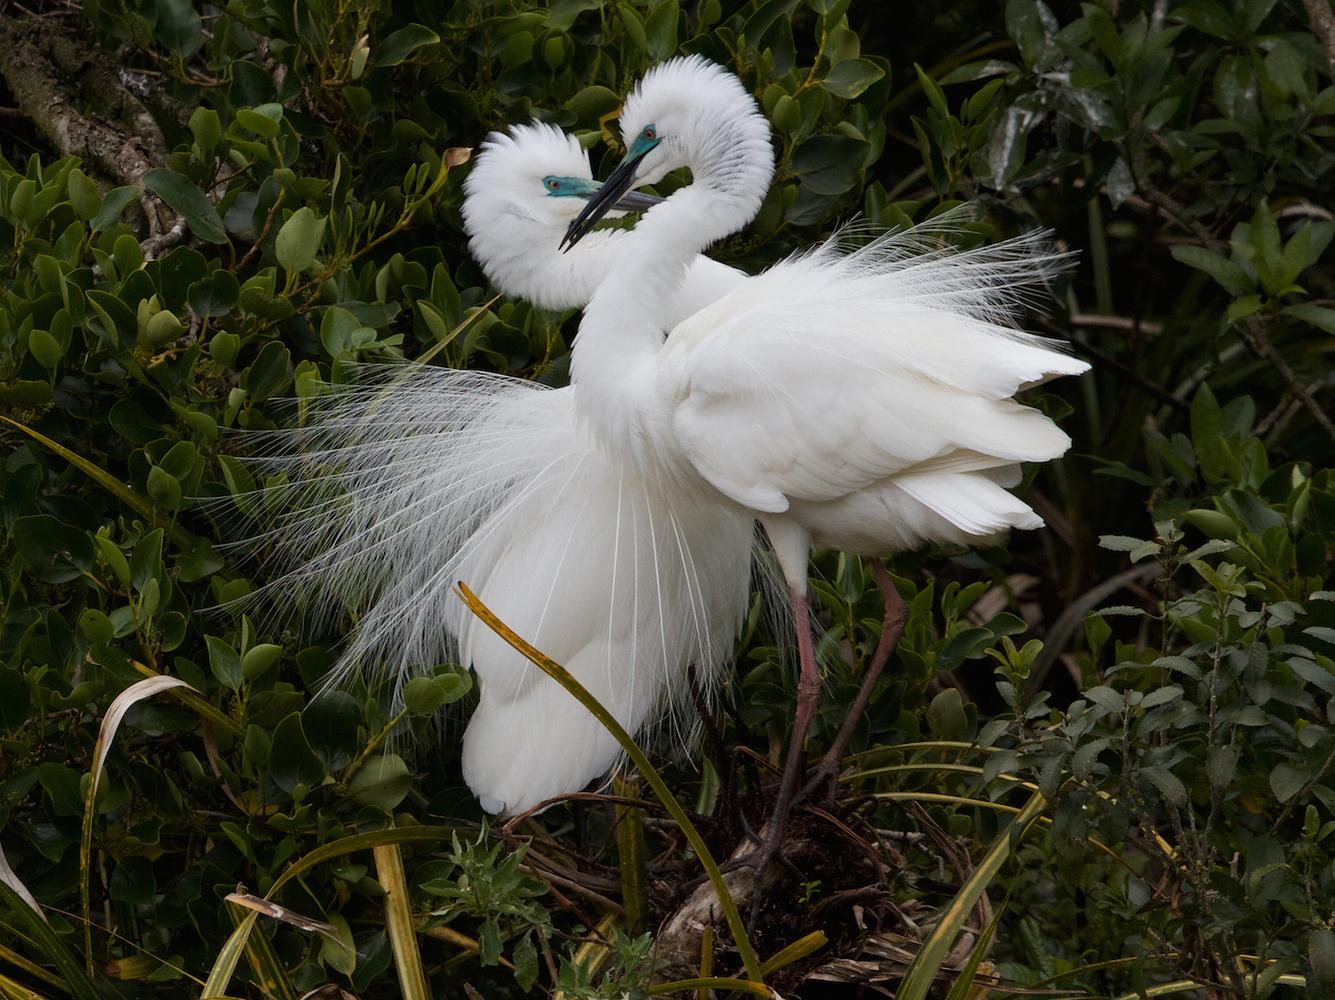 White Heron bonding behaviour by Murry Cave